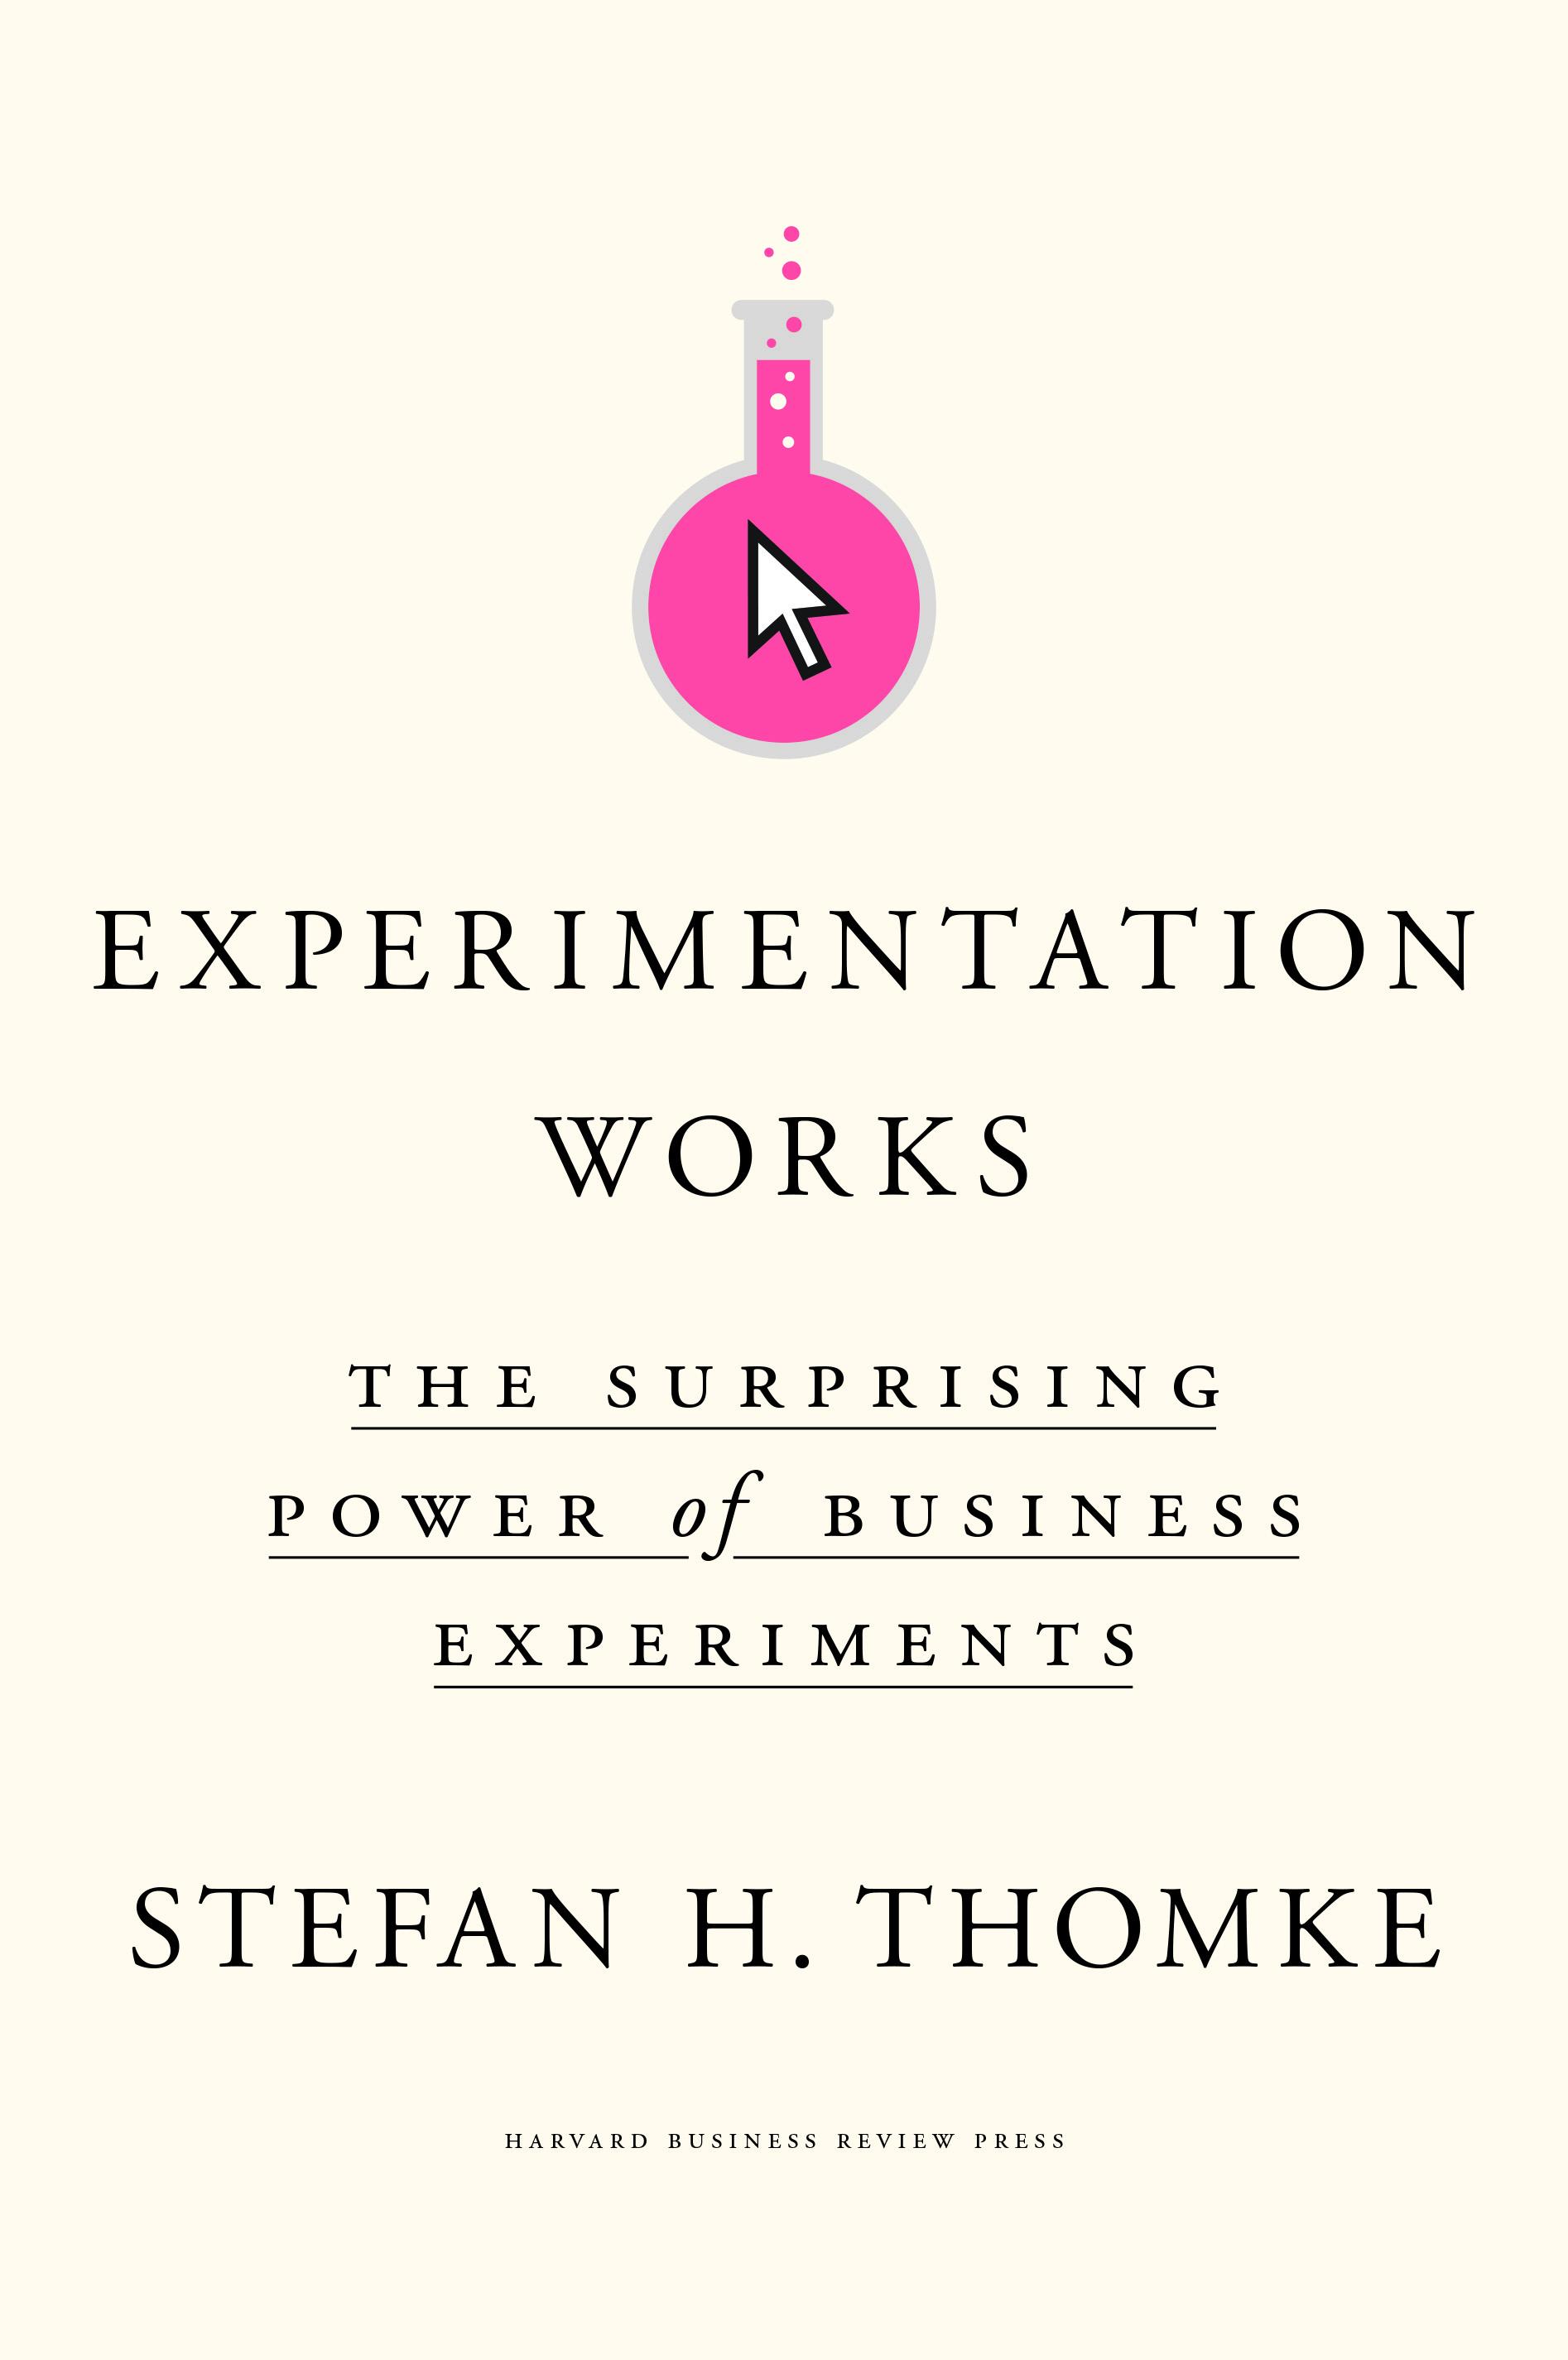 Stefan H  Thomke - Faculty & Research - Harvard Business School